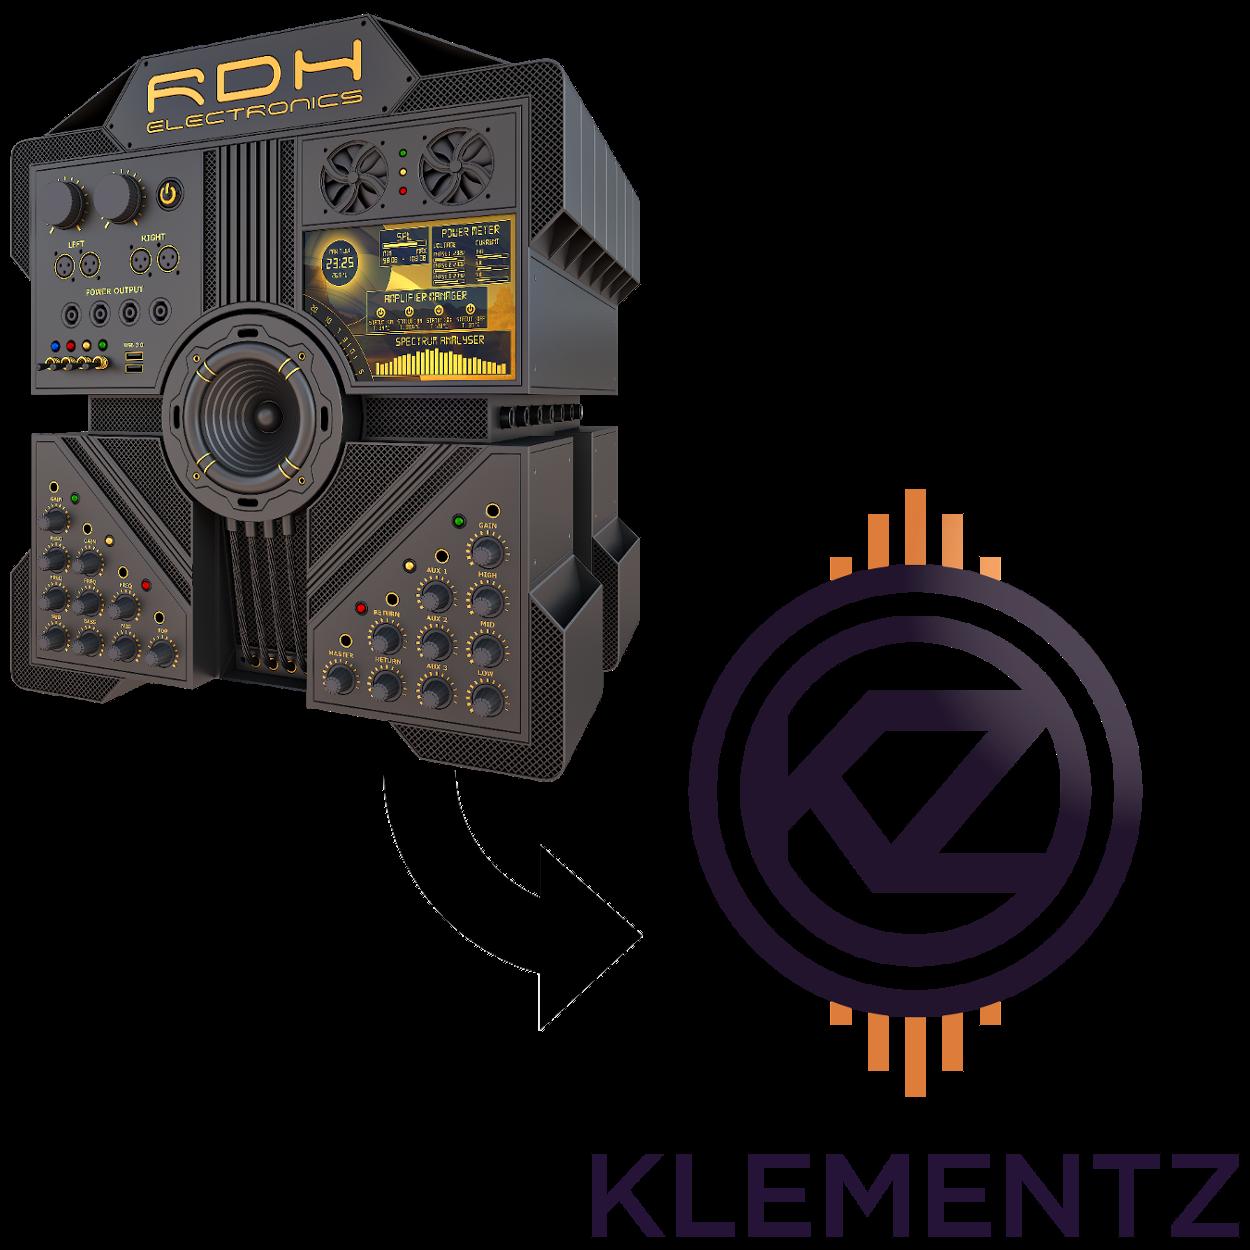 RDH Electronics becomes KLEMENTZ